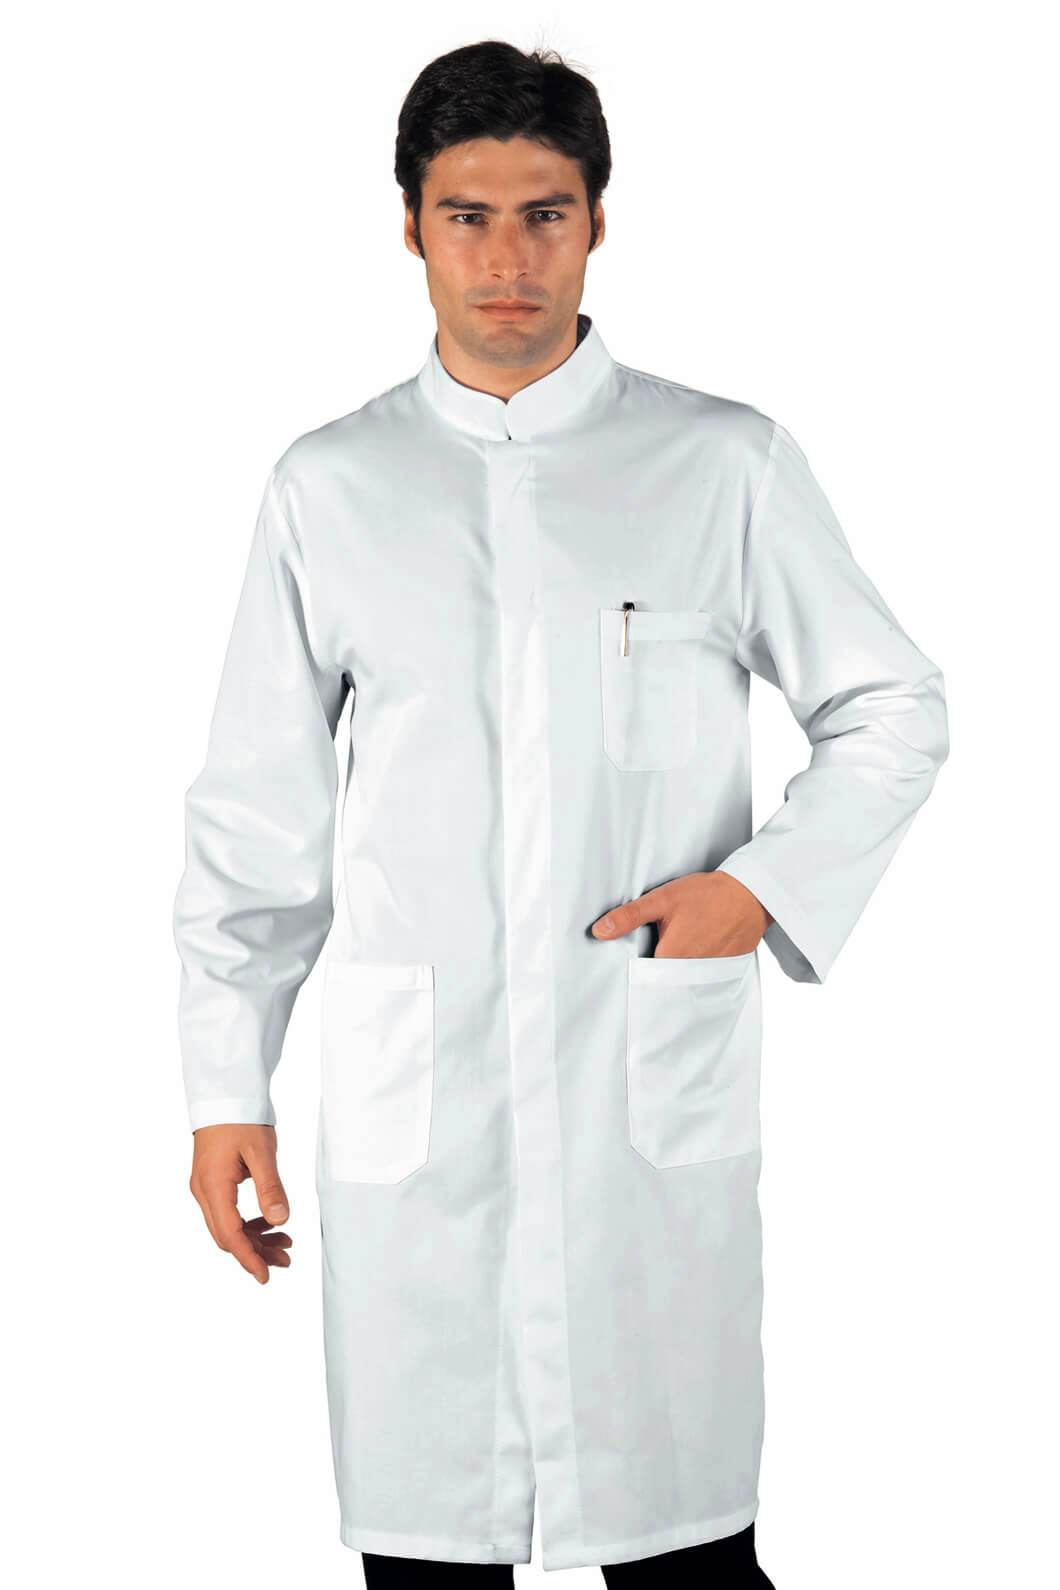 blouse blanche homme laboratoire. Black Bedroom Furniture Sets. Home Design Ideas